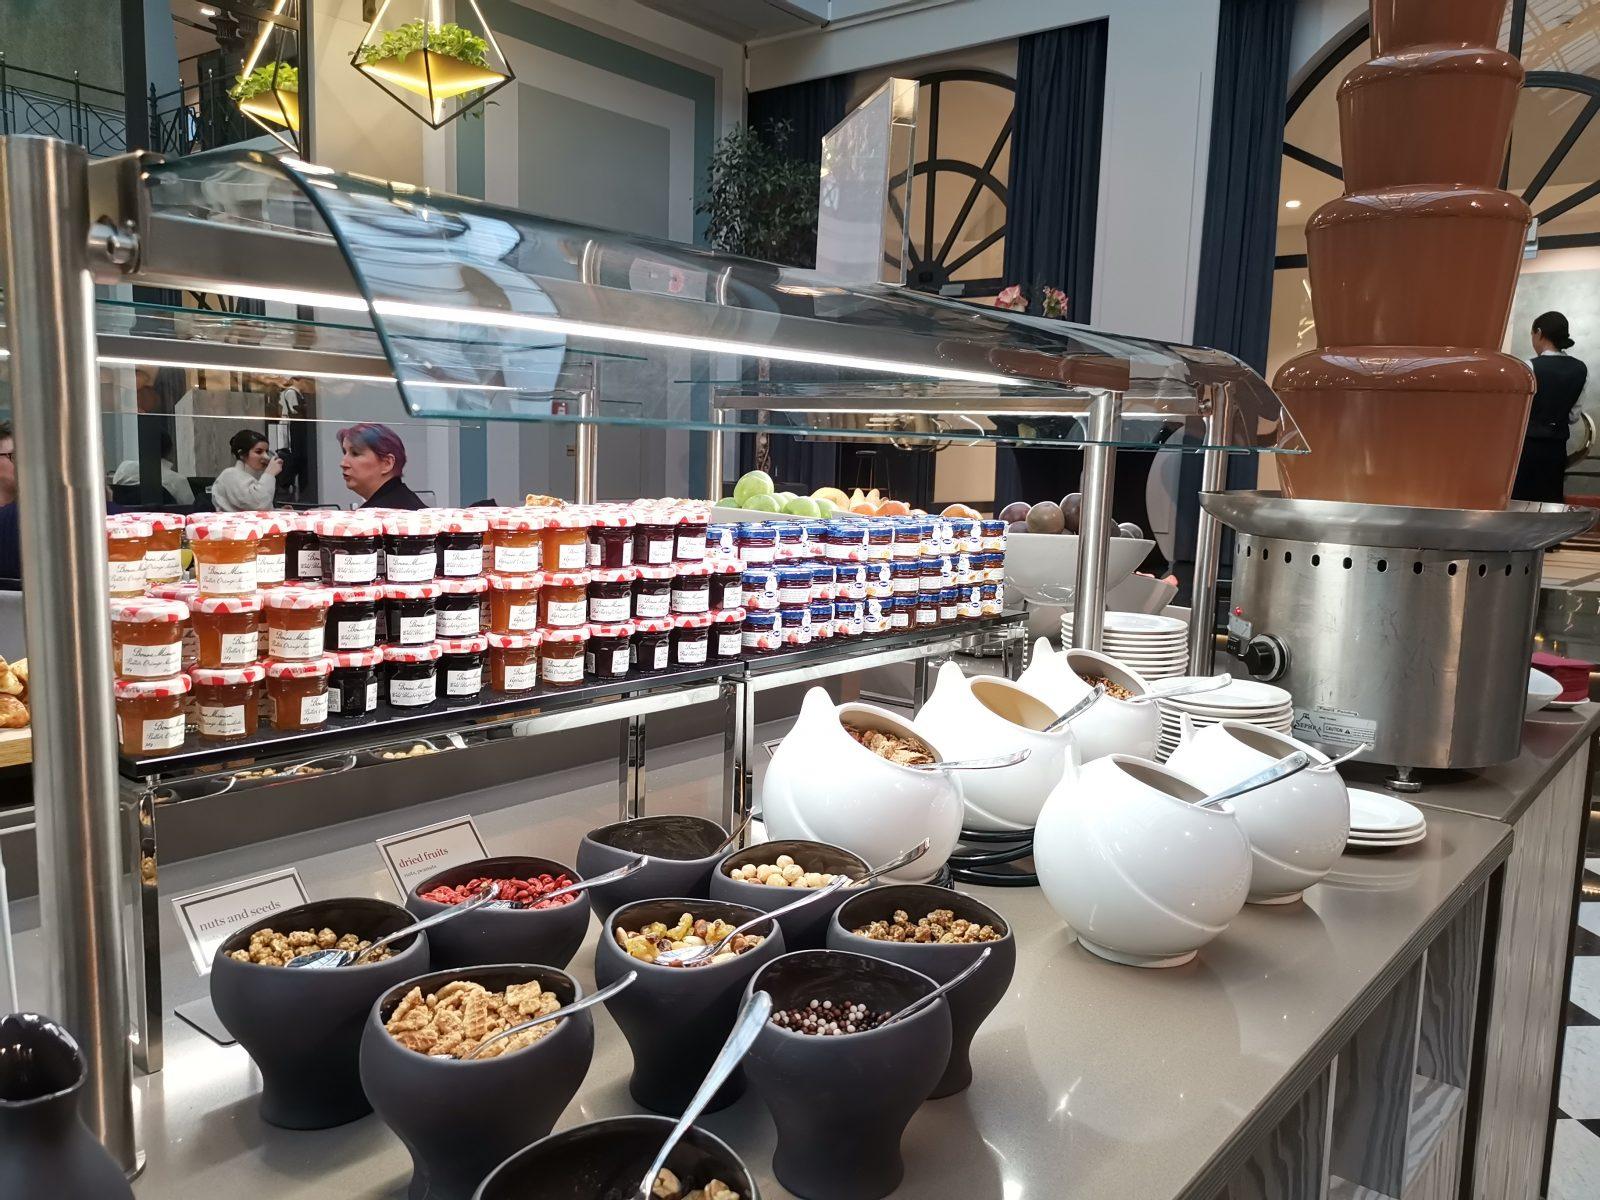 NH コレクション アムステルダム グランド ホテル クラスナポルスキーの朝食(シリアル、ジャム)